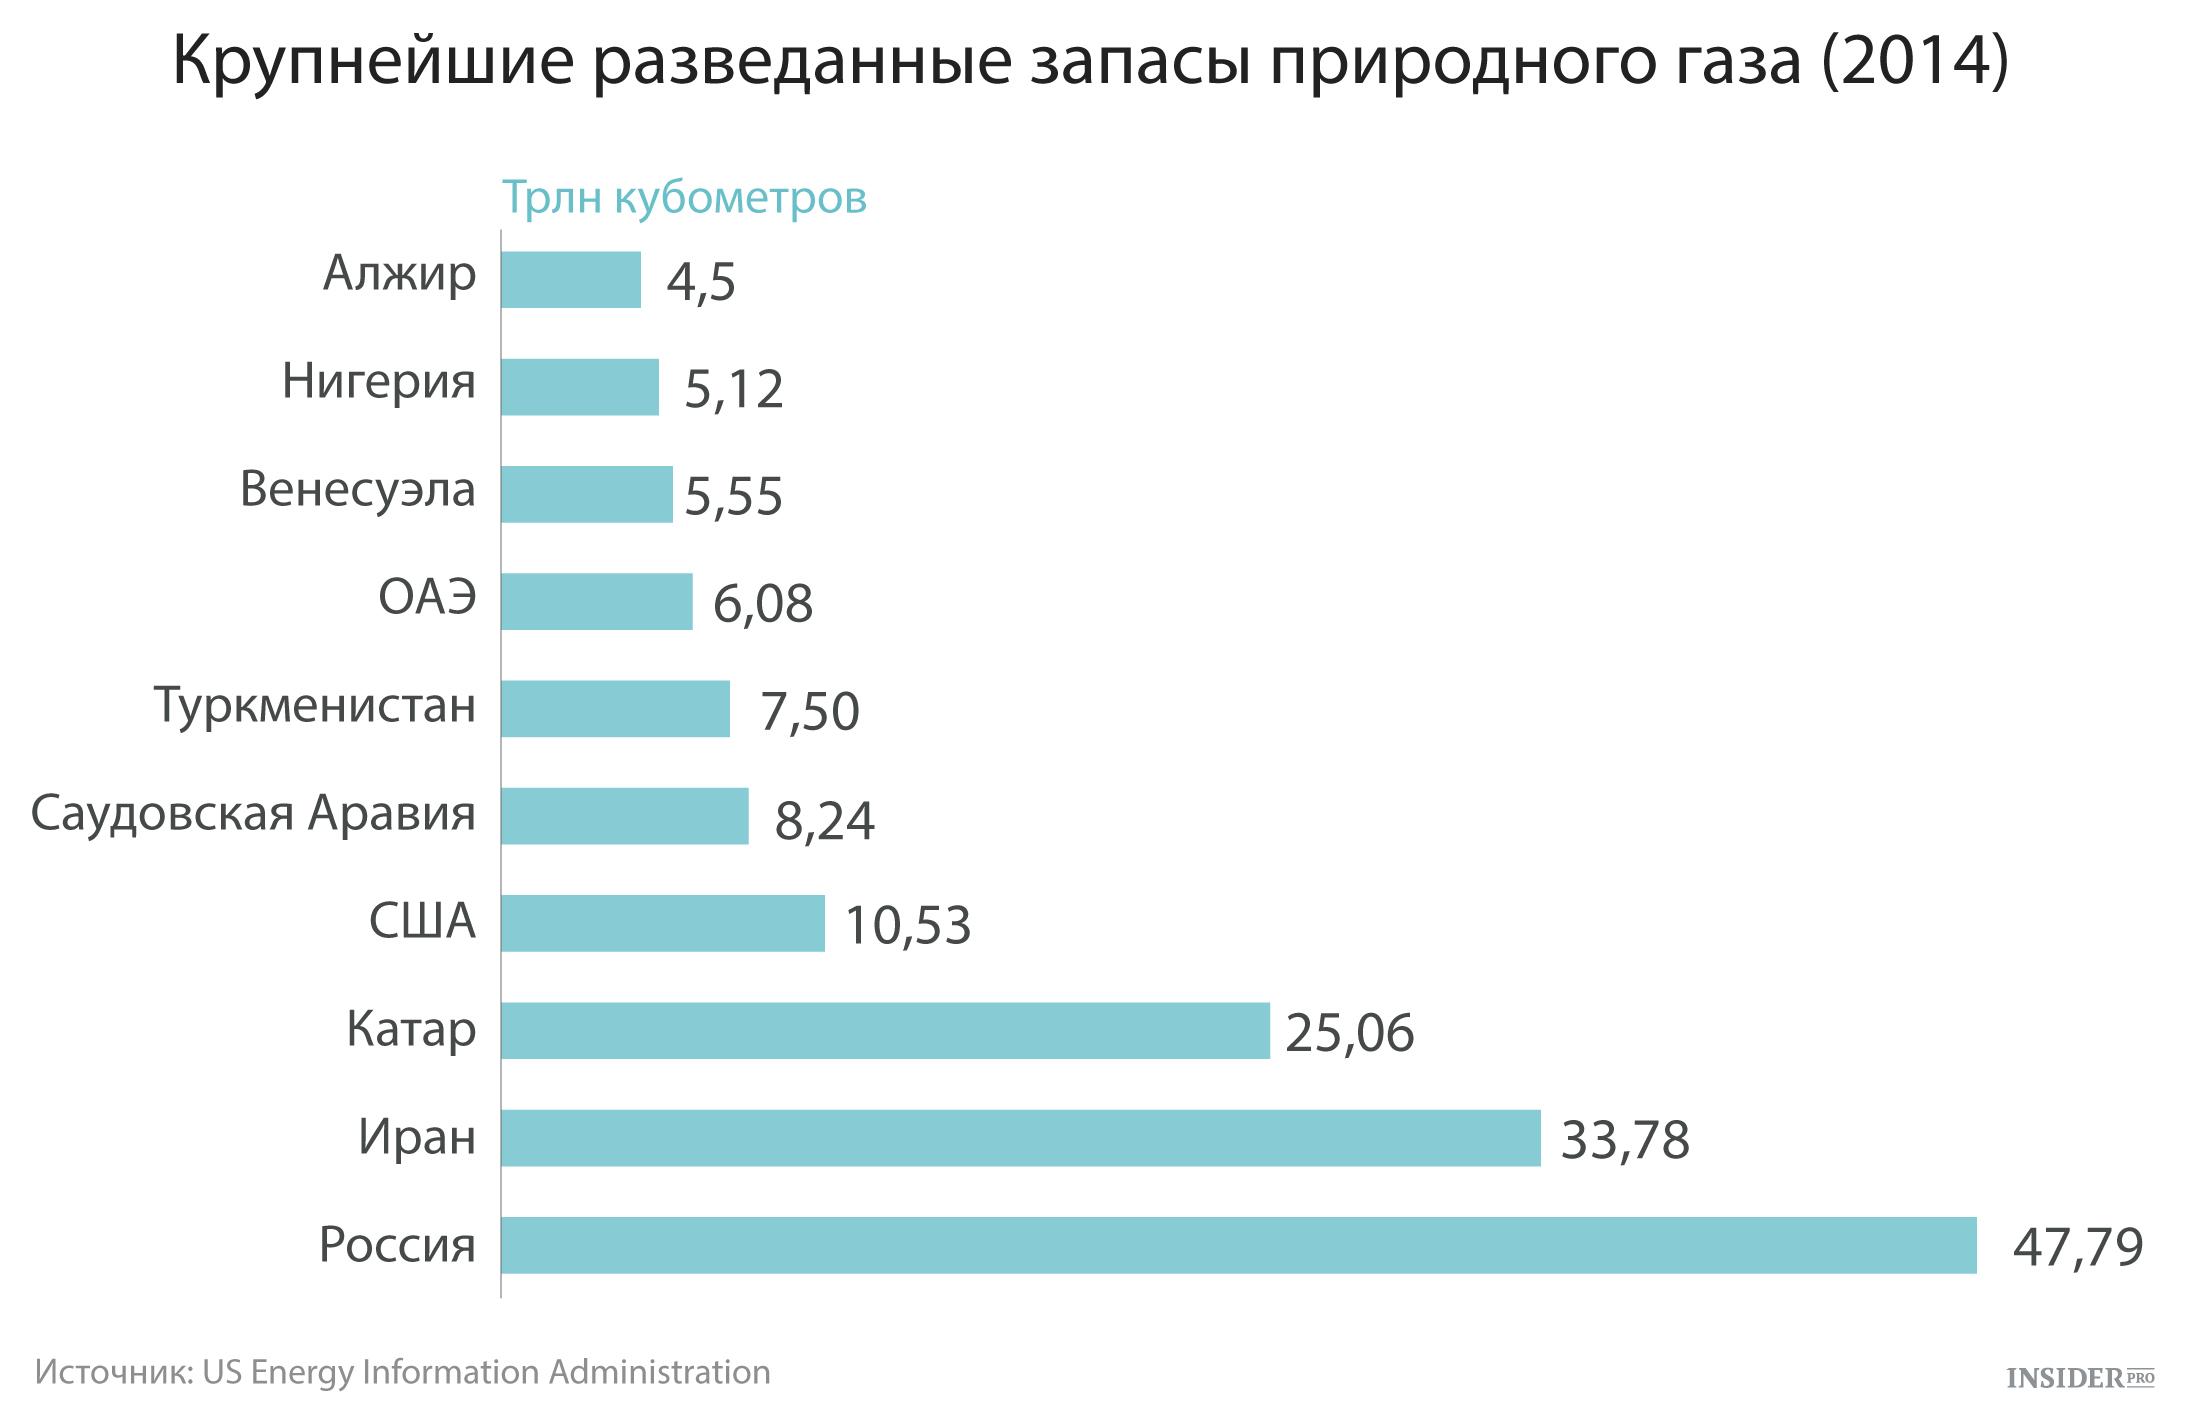 россия занимает 3 место по запасам